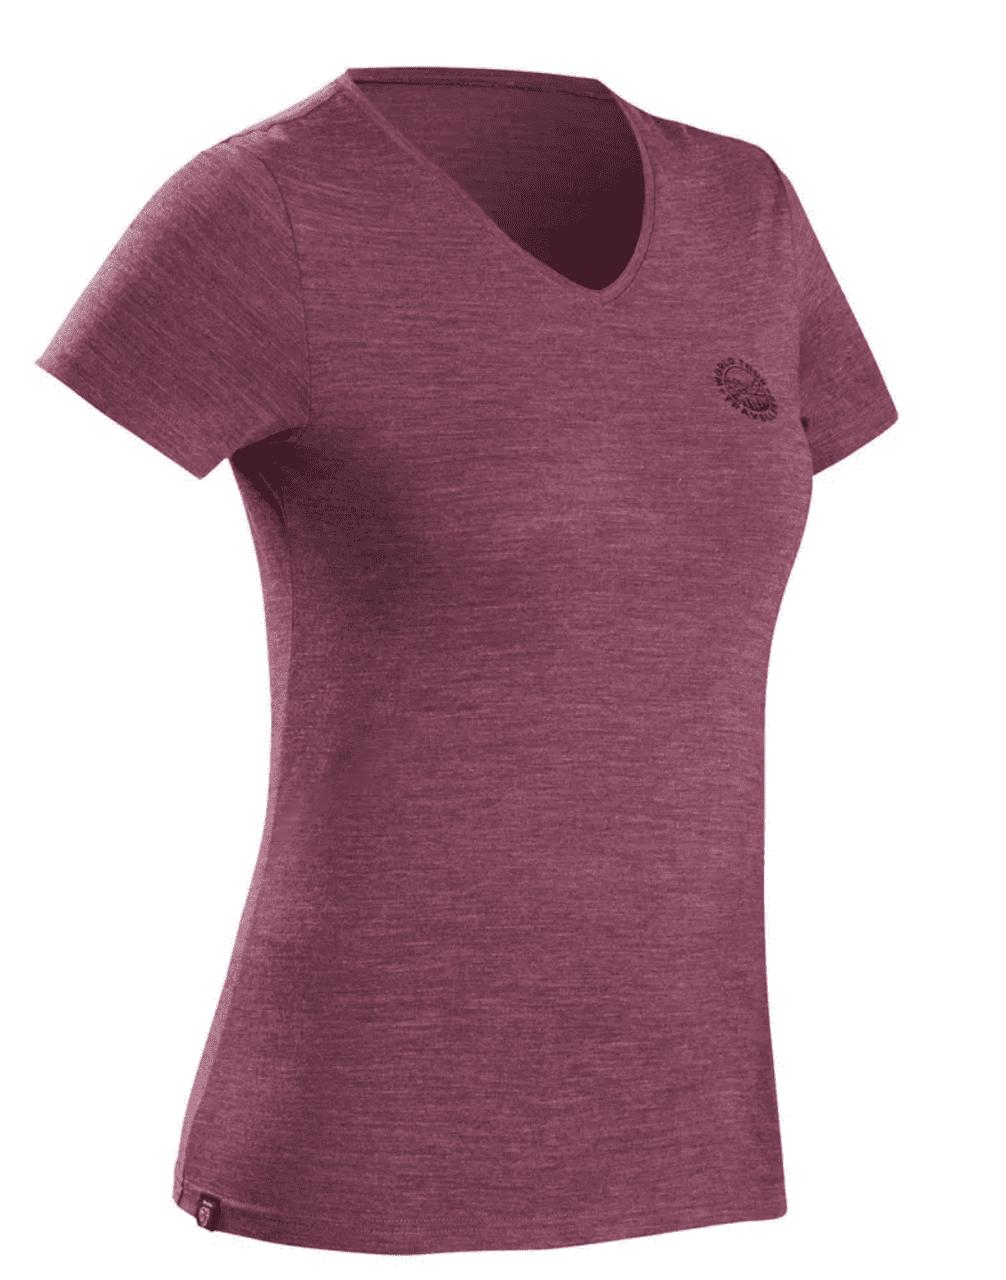 t-shirt decathlon